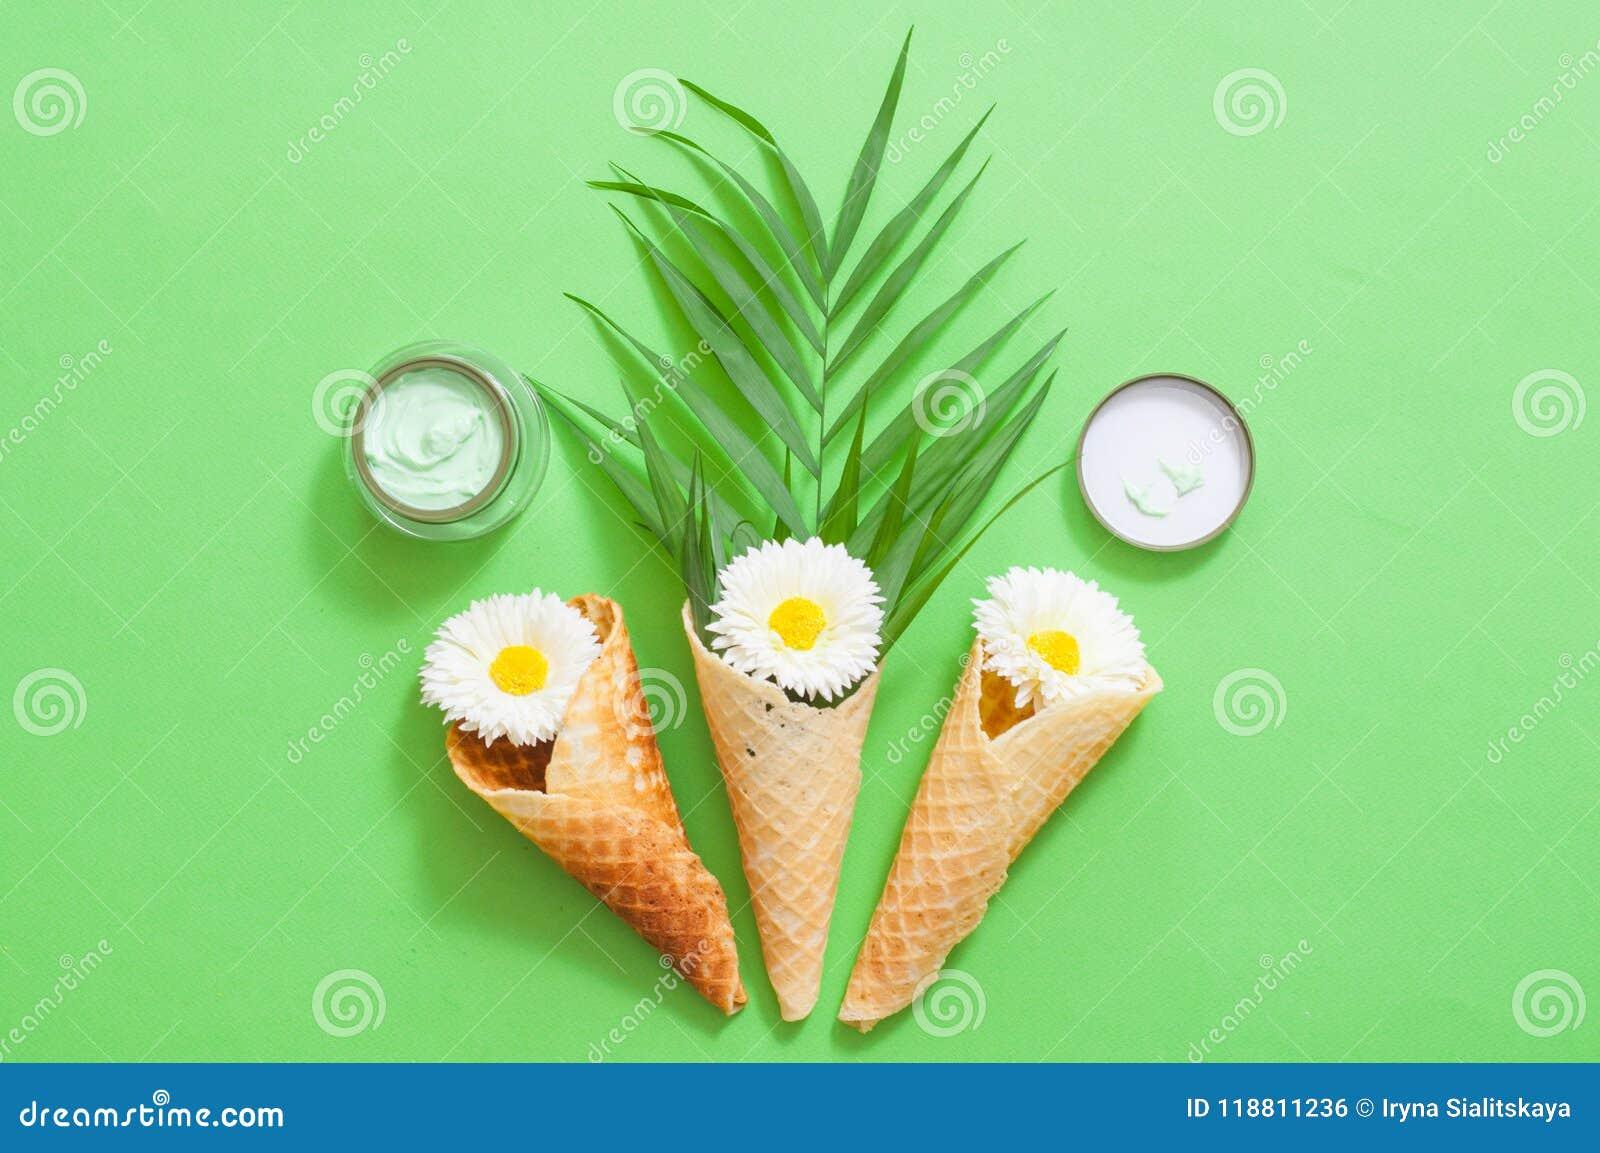 Image Of Homemade Cosmetics Ingredients  Aroma Theme Stock Photo